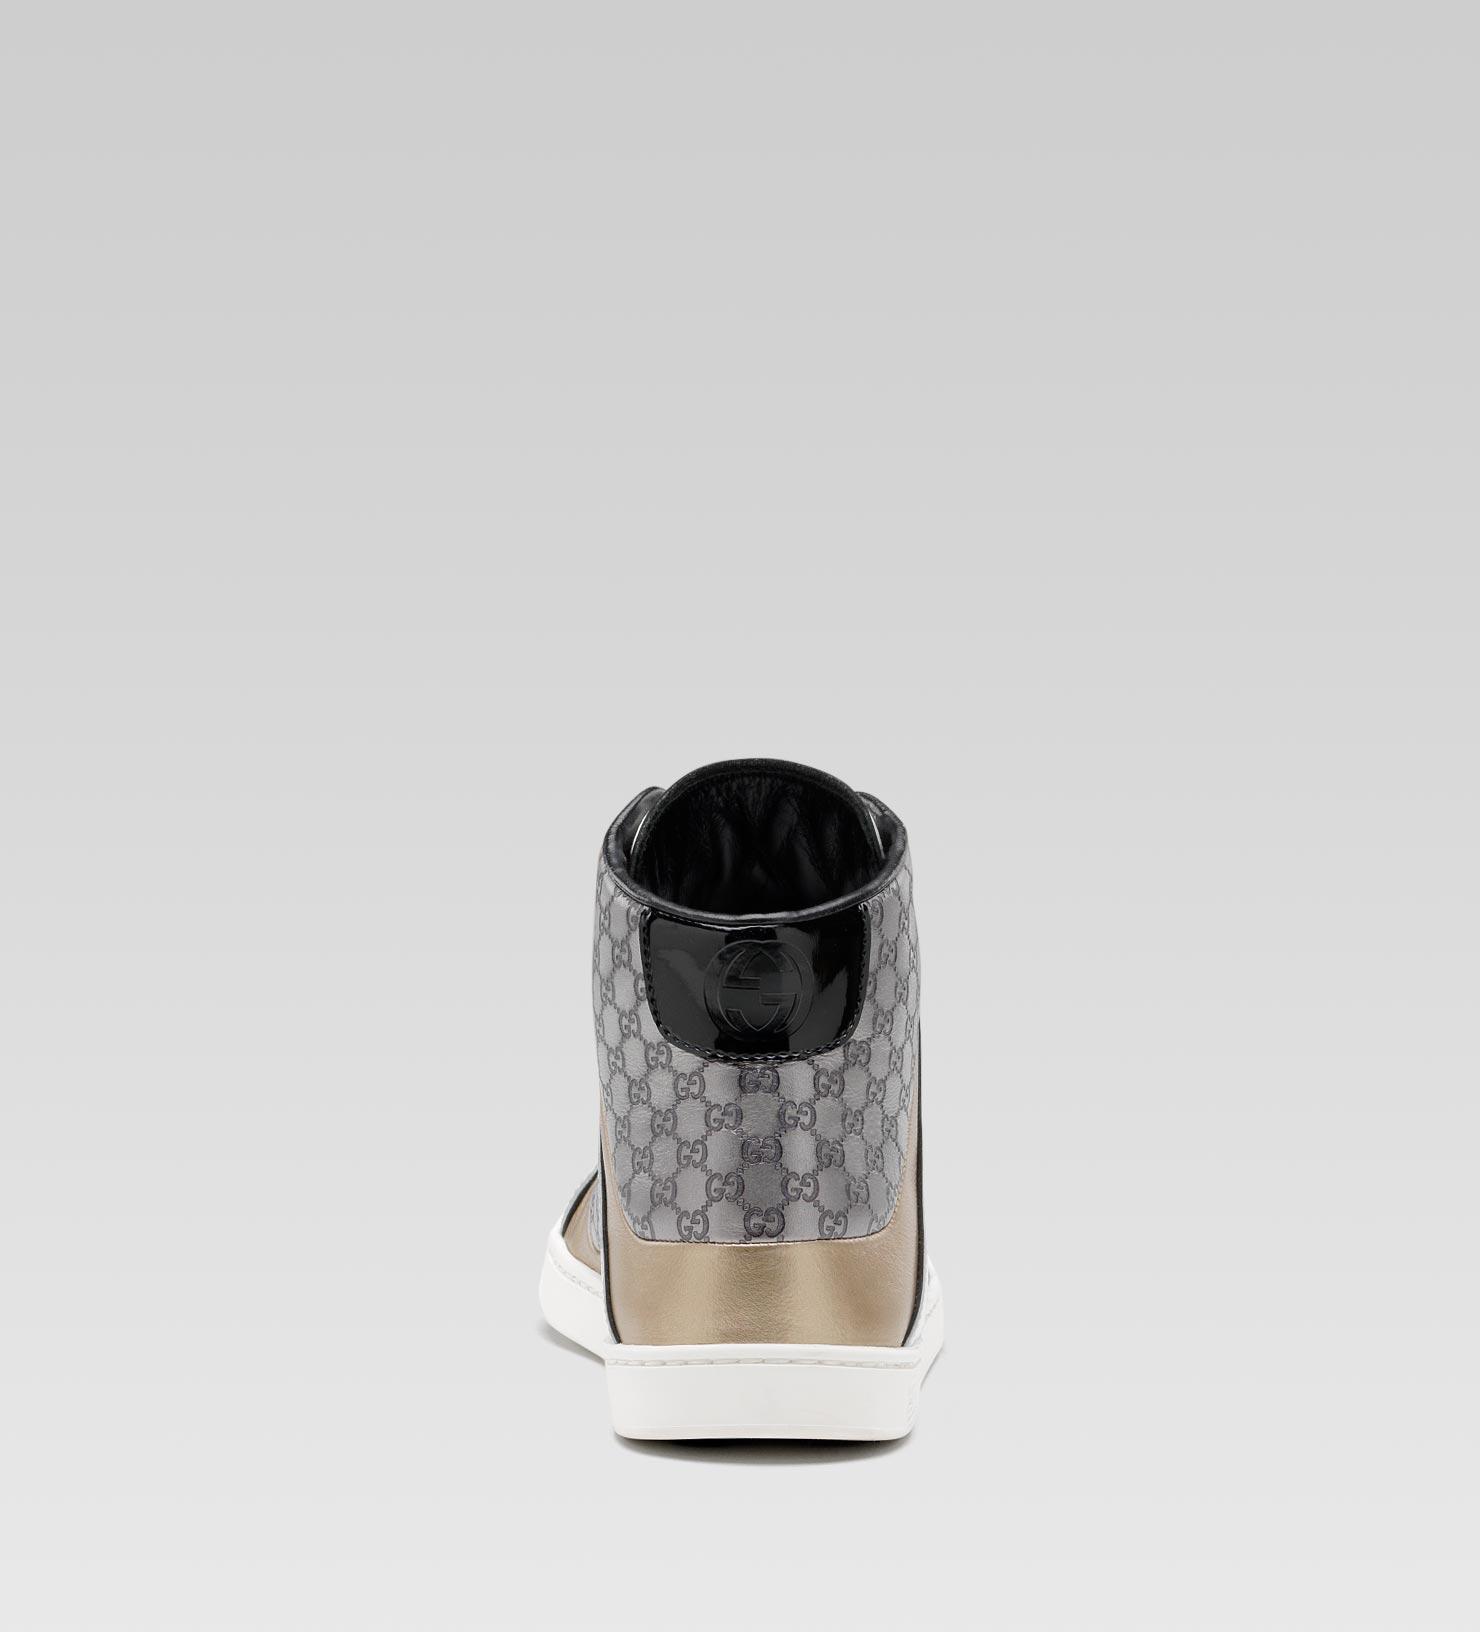 17363eef5 Gucci Coda Pop Hightop Sneaker in White - Lyst